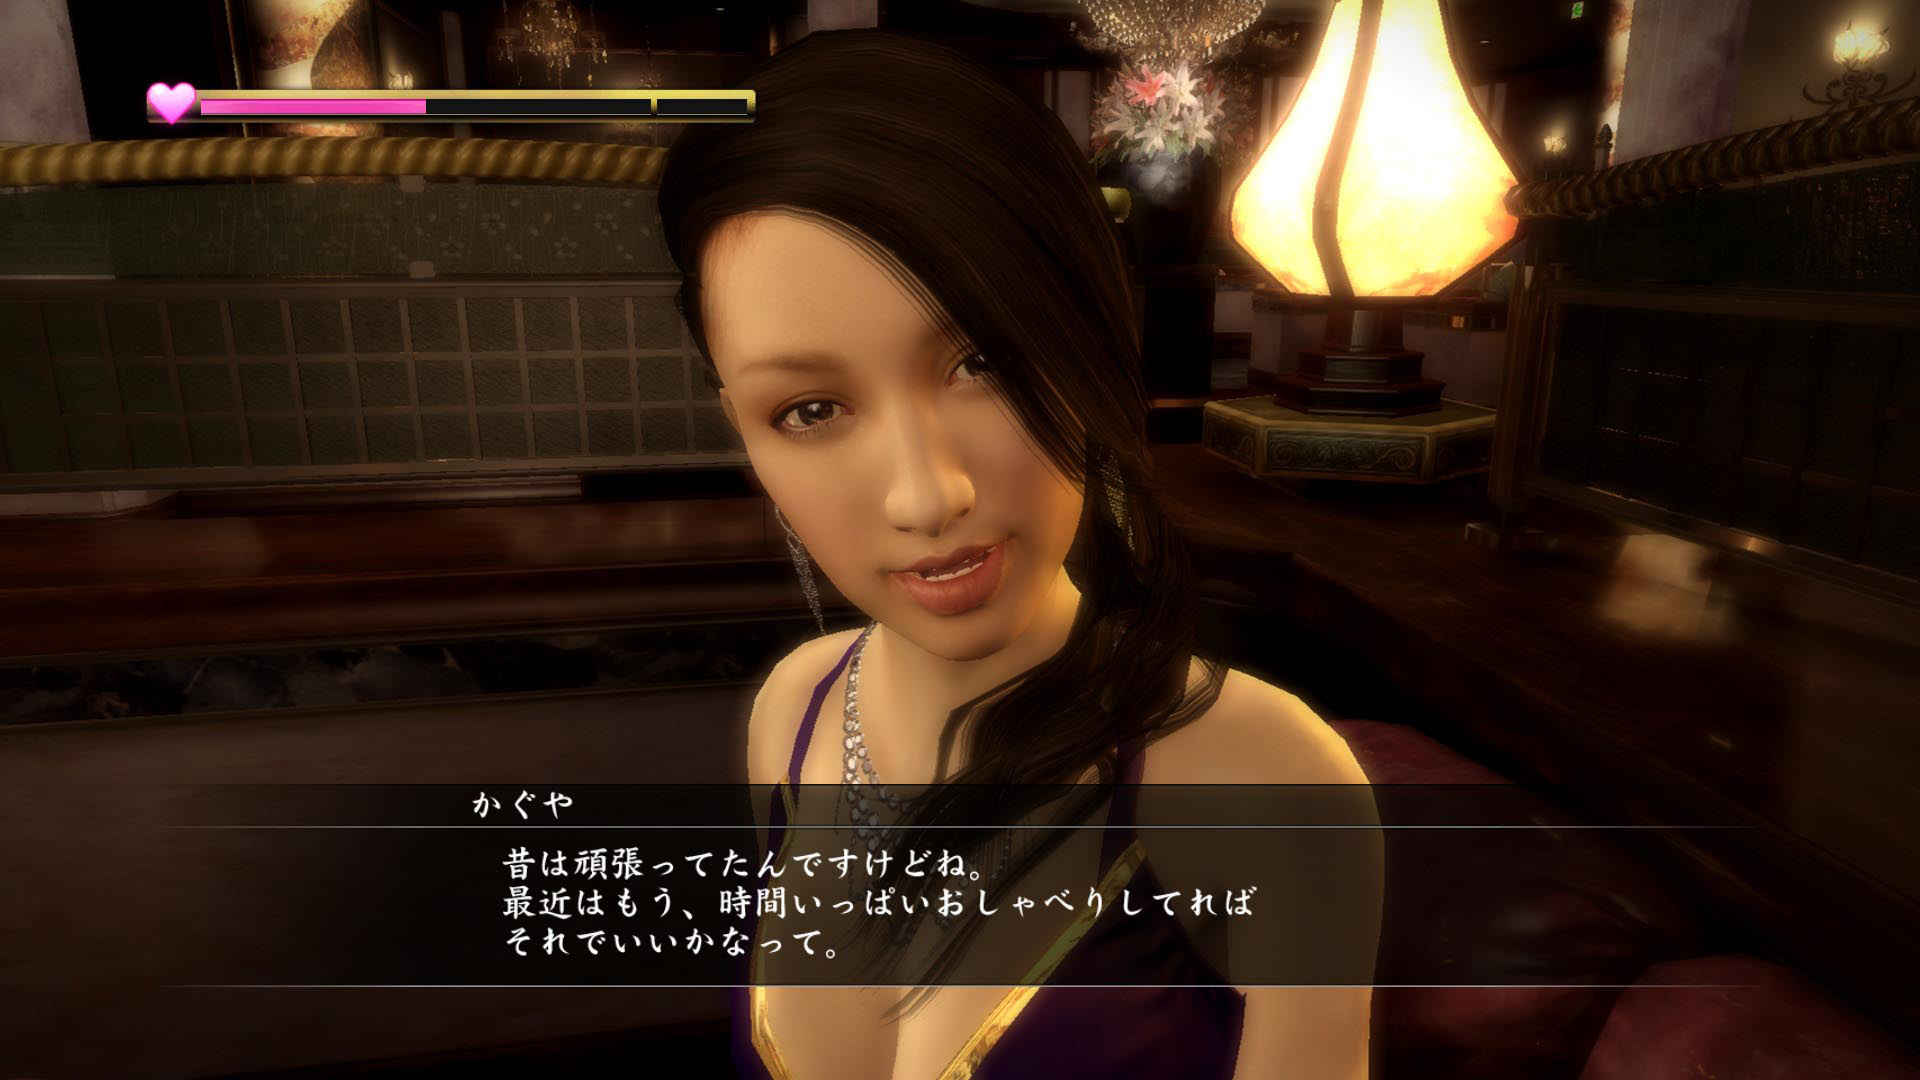 Yakuza 5 Girl Characters From The Clubs   Senpai Gamer   HD Wallpaper